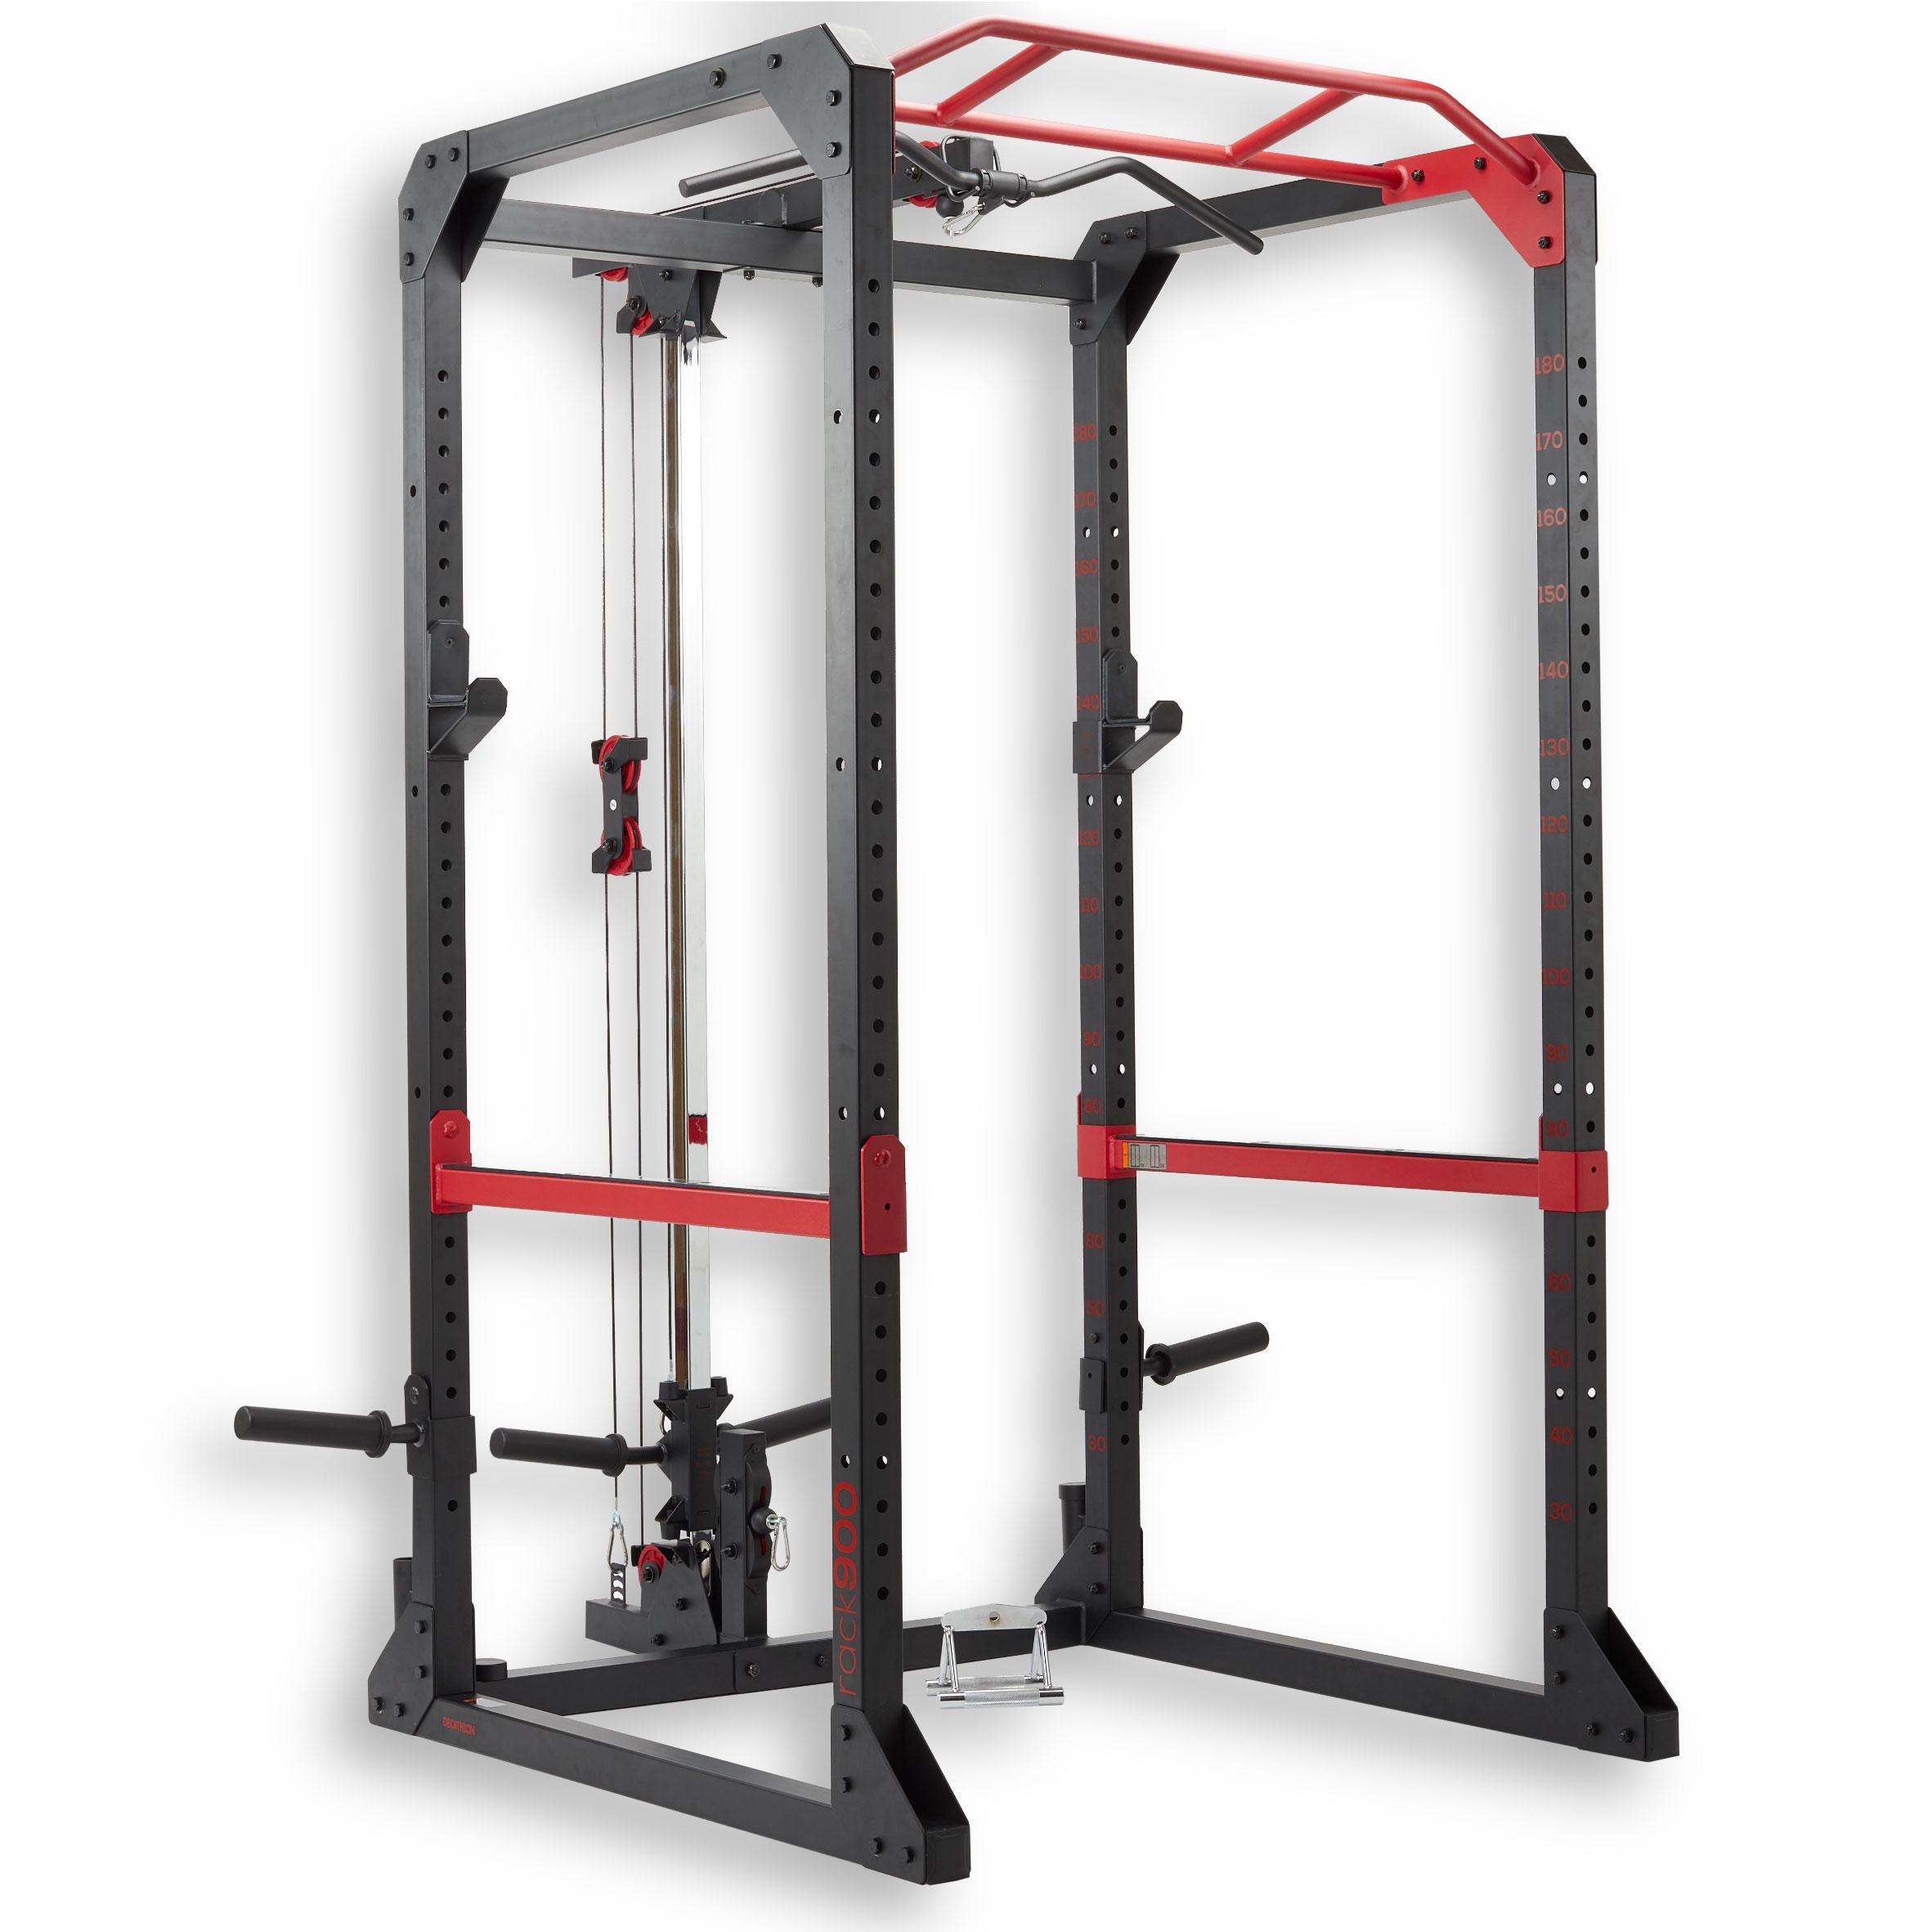 Aparat Bodybuilding Rack 900 imagine